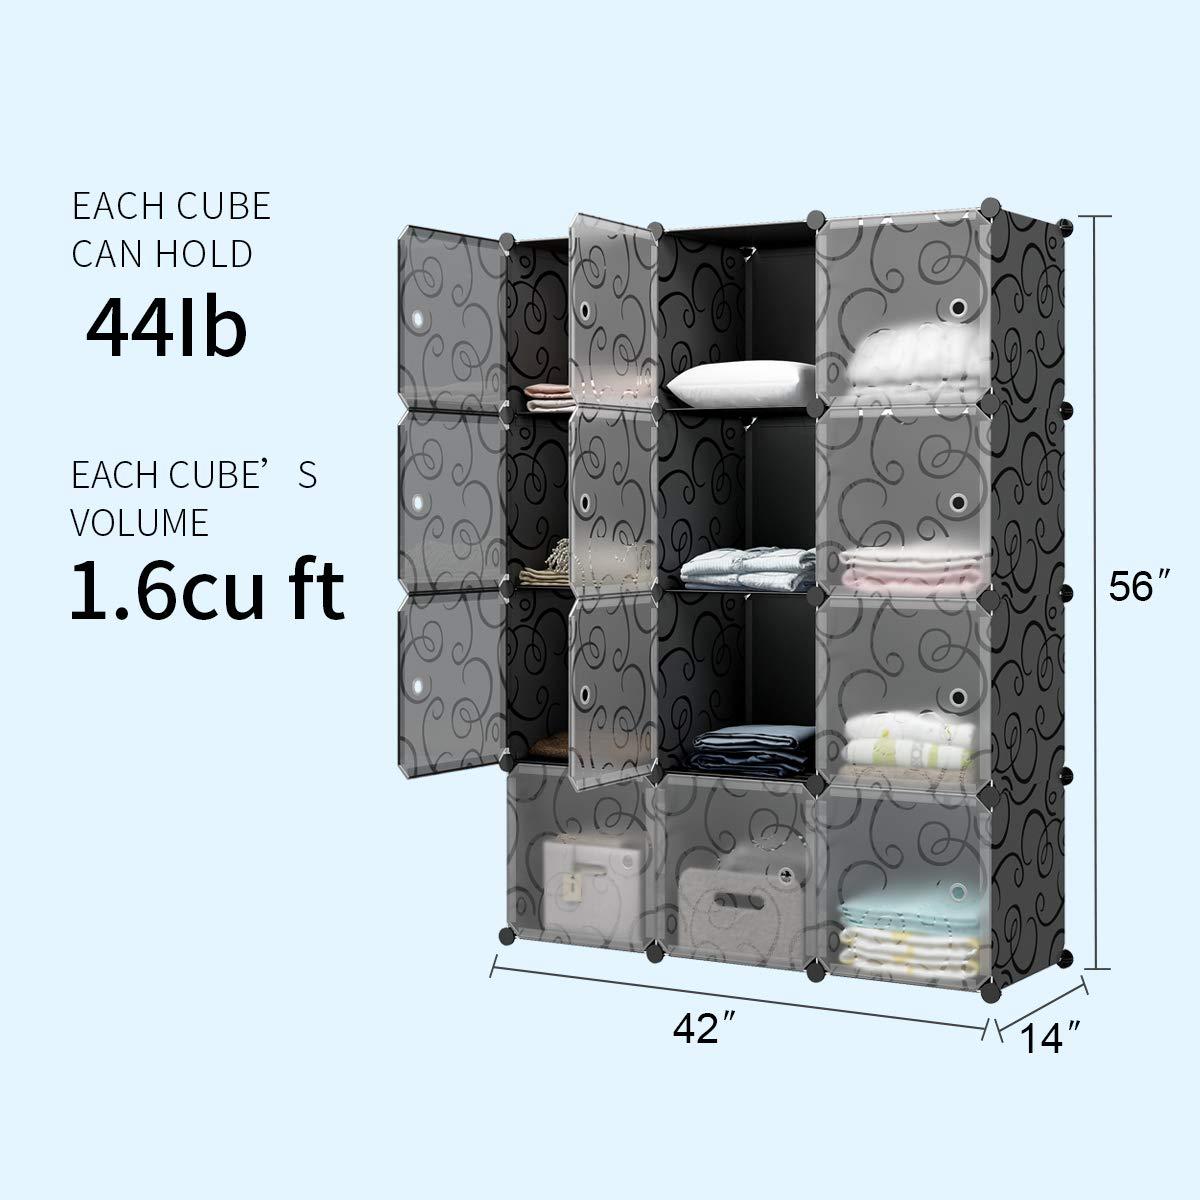 KOUSI Portable Storage Cubbies Storage Shelves Storage Organizer Shelf for Clothes Portable Shelf Toy Organizer Cabinet Plastic Dresser Clothes Storage Storage Cubes, Black, 12 Cubes by KOUSI (Image #4)